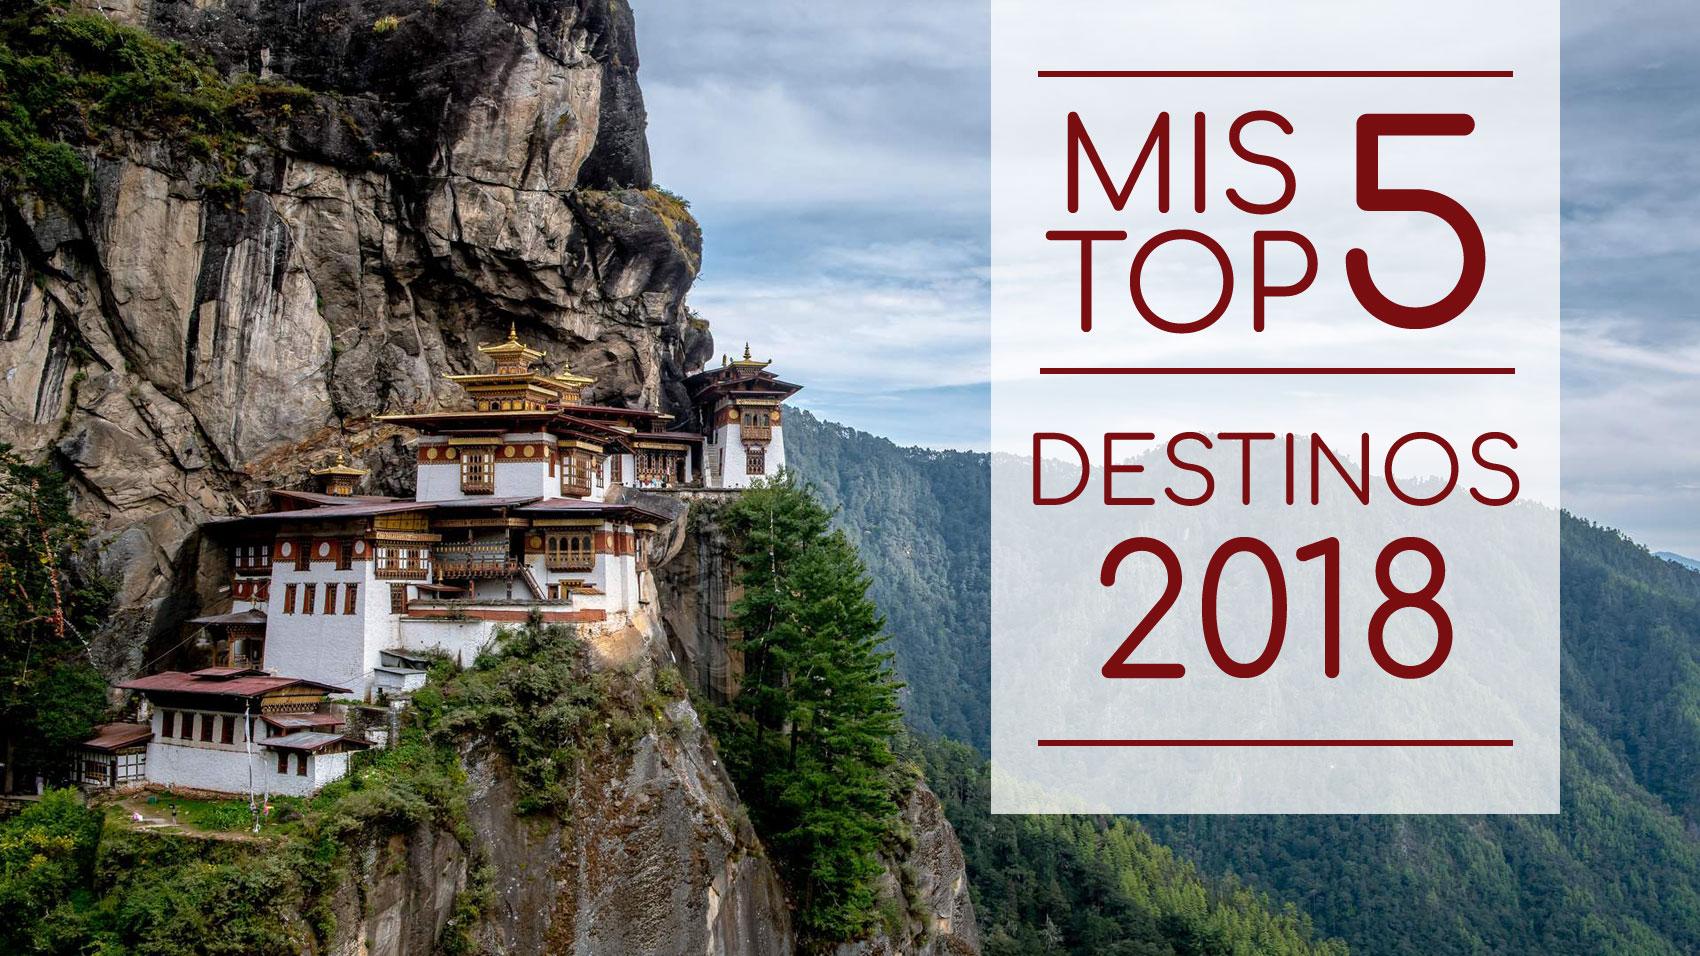 Top 5 destinos para 2018